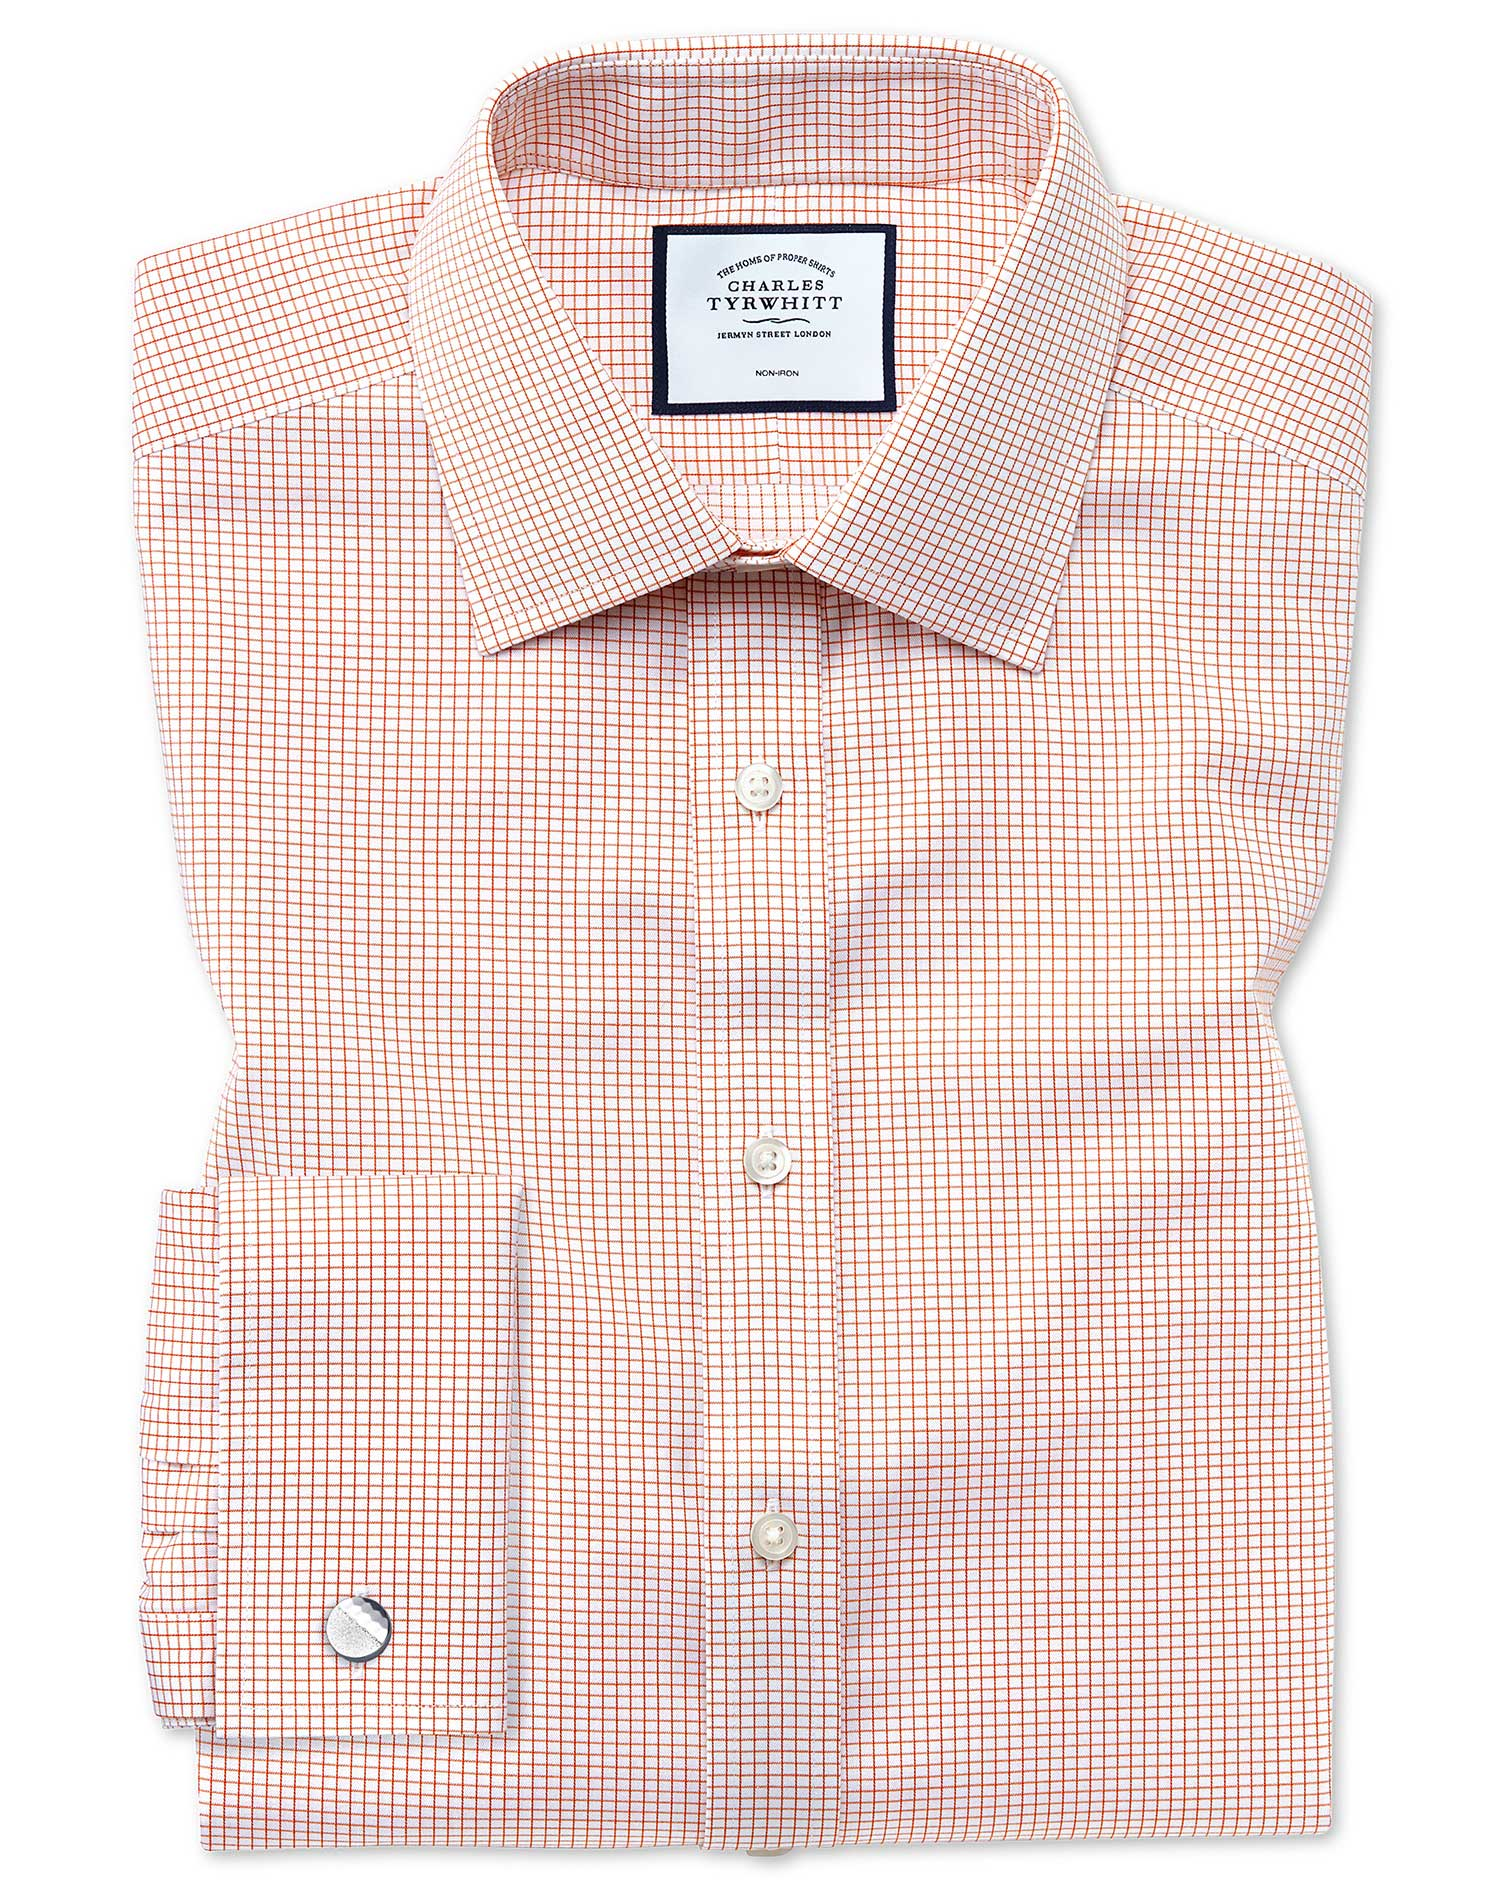 Slim Fit Non-Iron Twill Mini Grid Check Orange Cotton Formal Shirt Single Cuff Size 17/34 by Charles